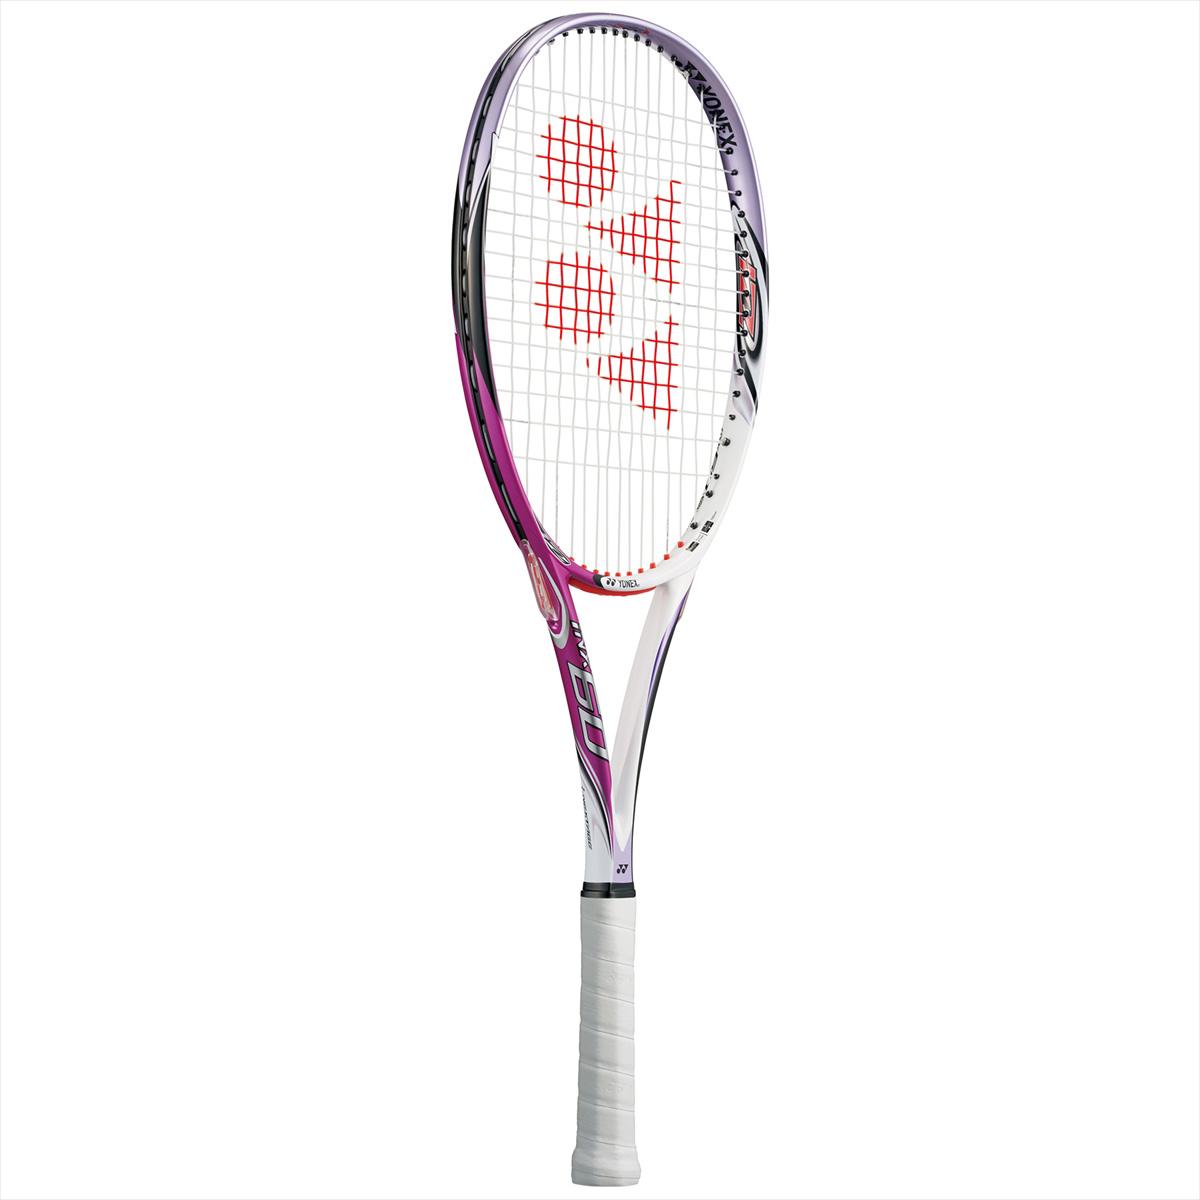 YONEX INX60 ソフトテニスラケット アイネクステージ60 ヨネックス【取り寄せ】